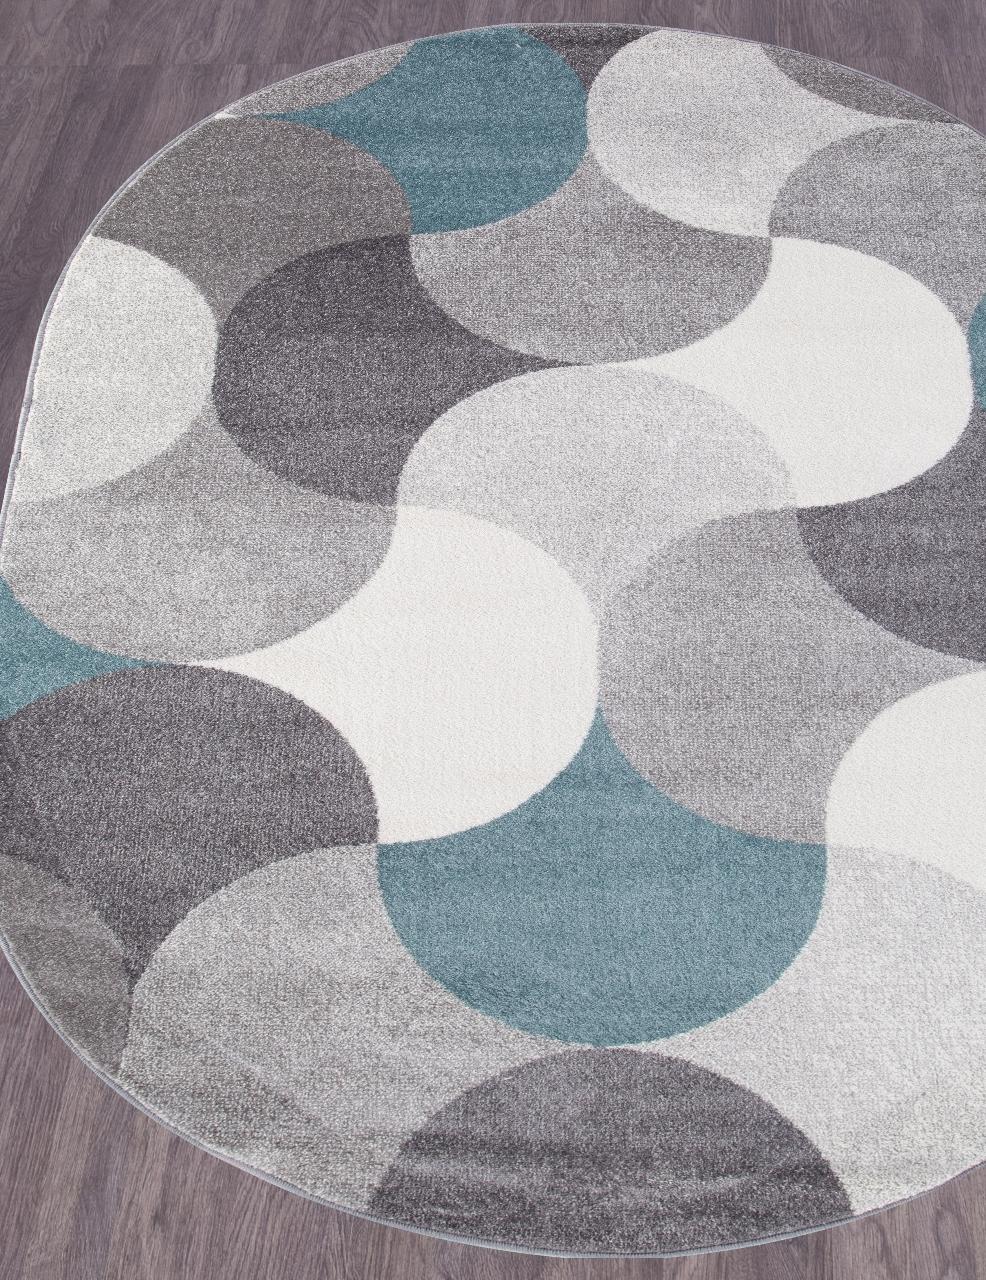 Ковер 2257 - LIGHT GRAY - Овал - коллекция SOFIT - фото 1